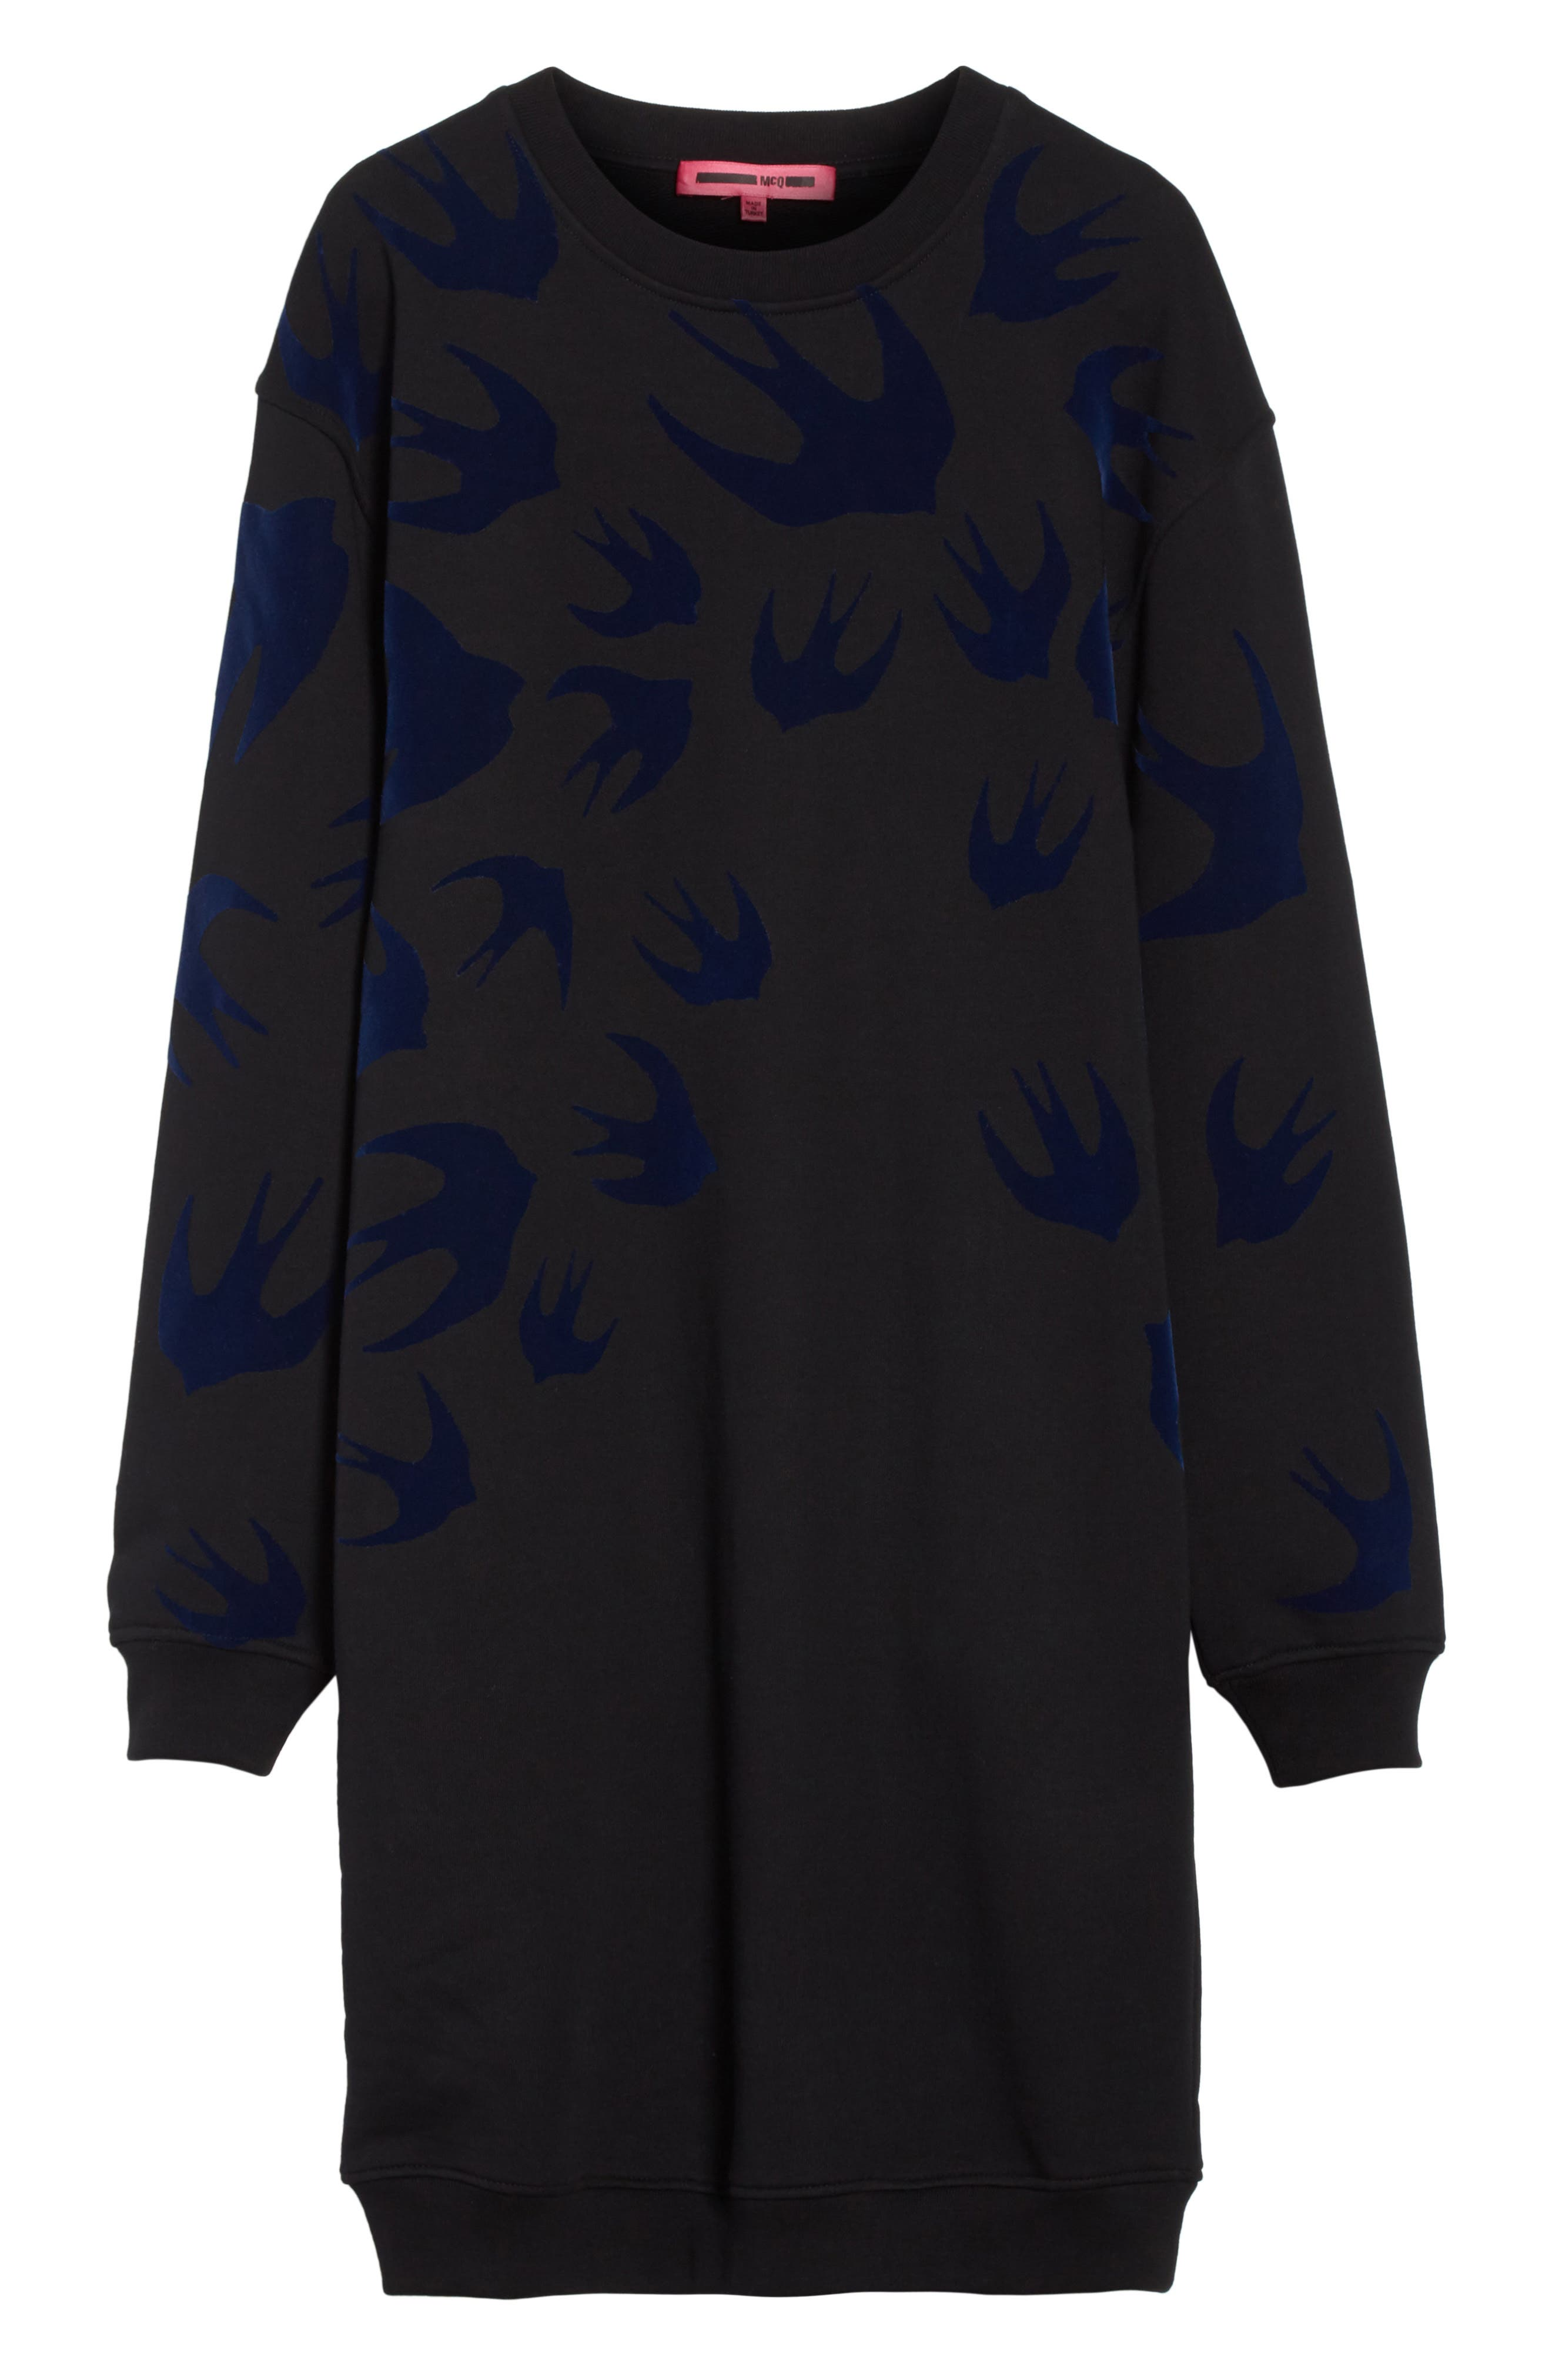 Swallow Classic Sweatshirt Dress,                             Alternate thumbnail 6, color,                             Black Multi